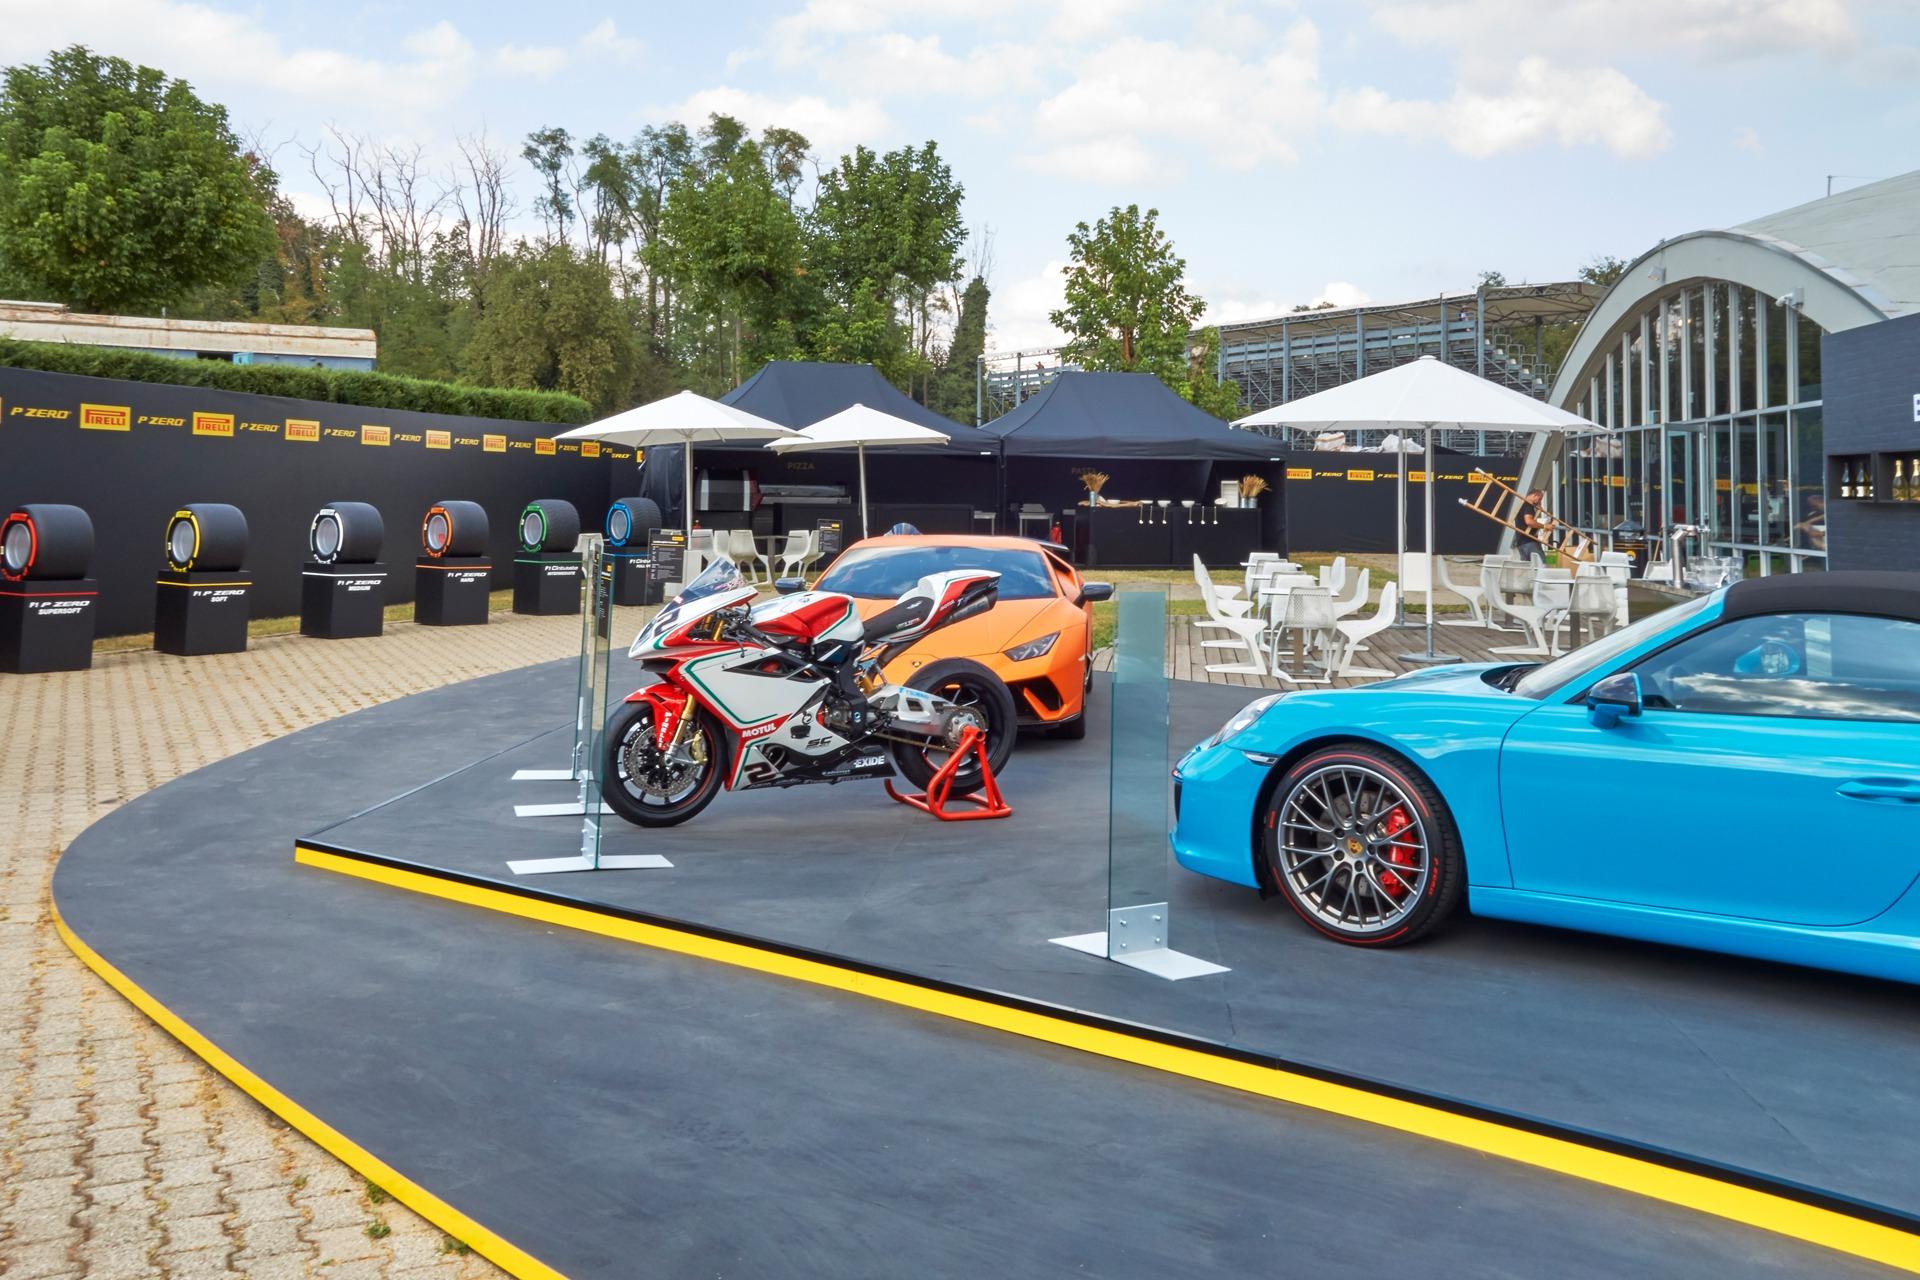 Pirelli Formel 1 Hospitality Monza